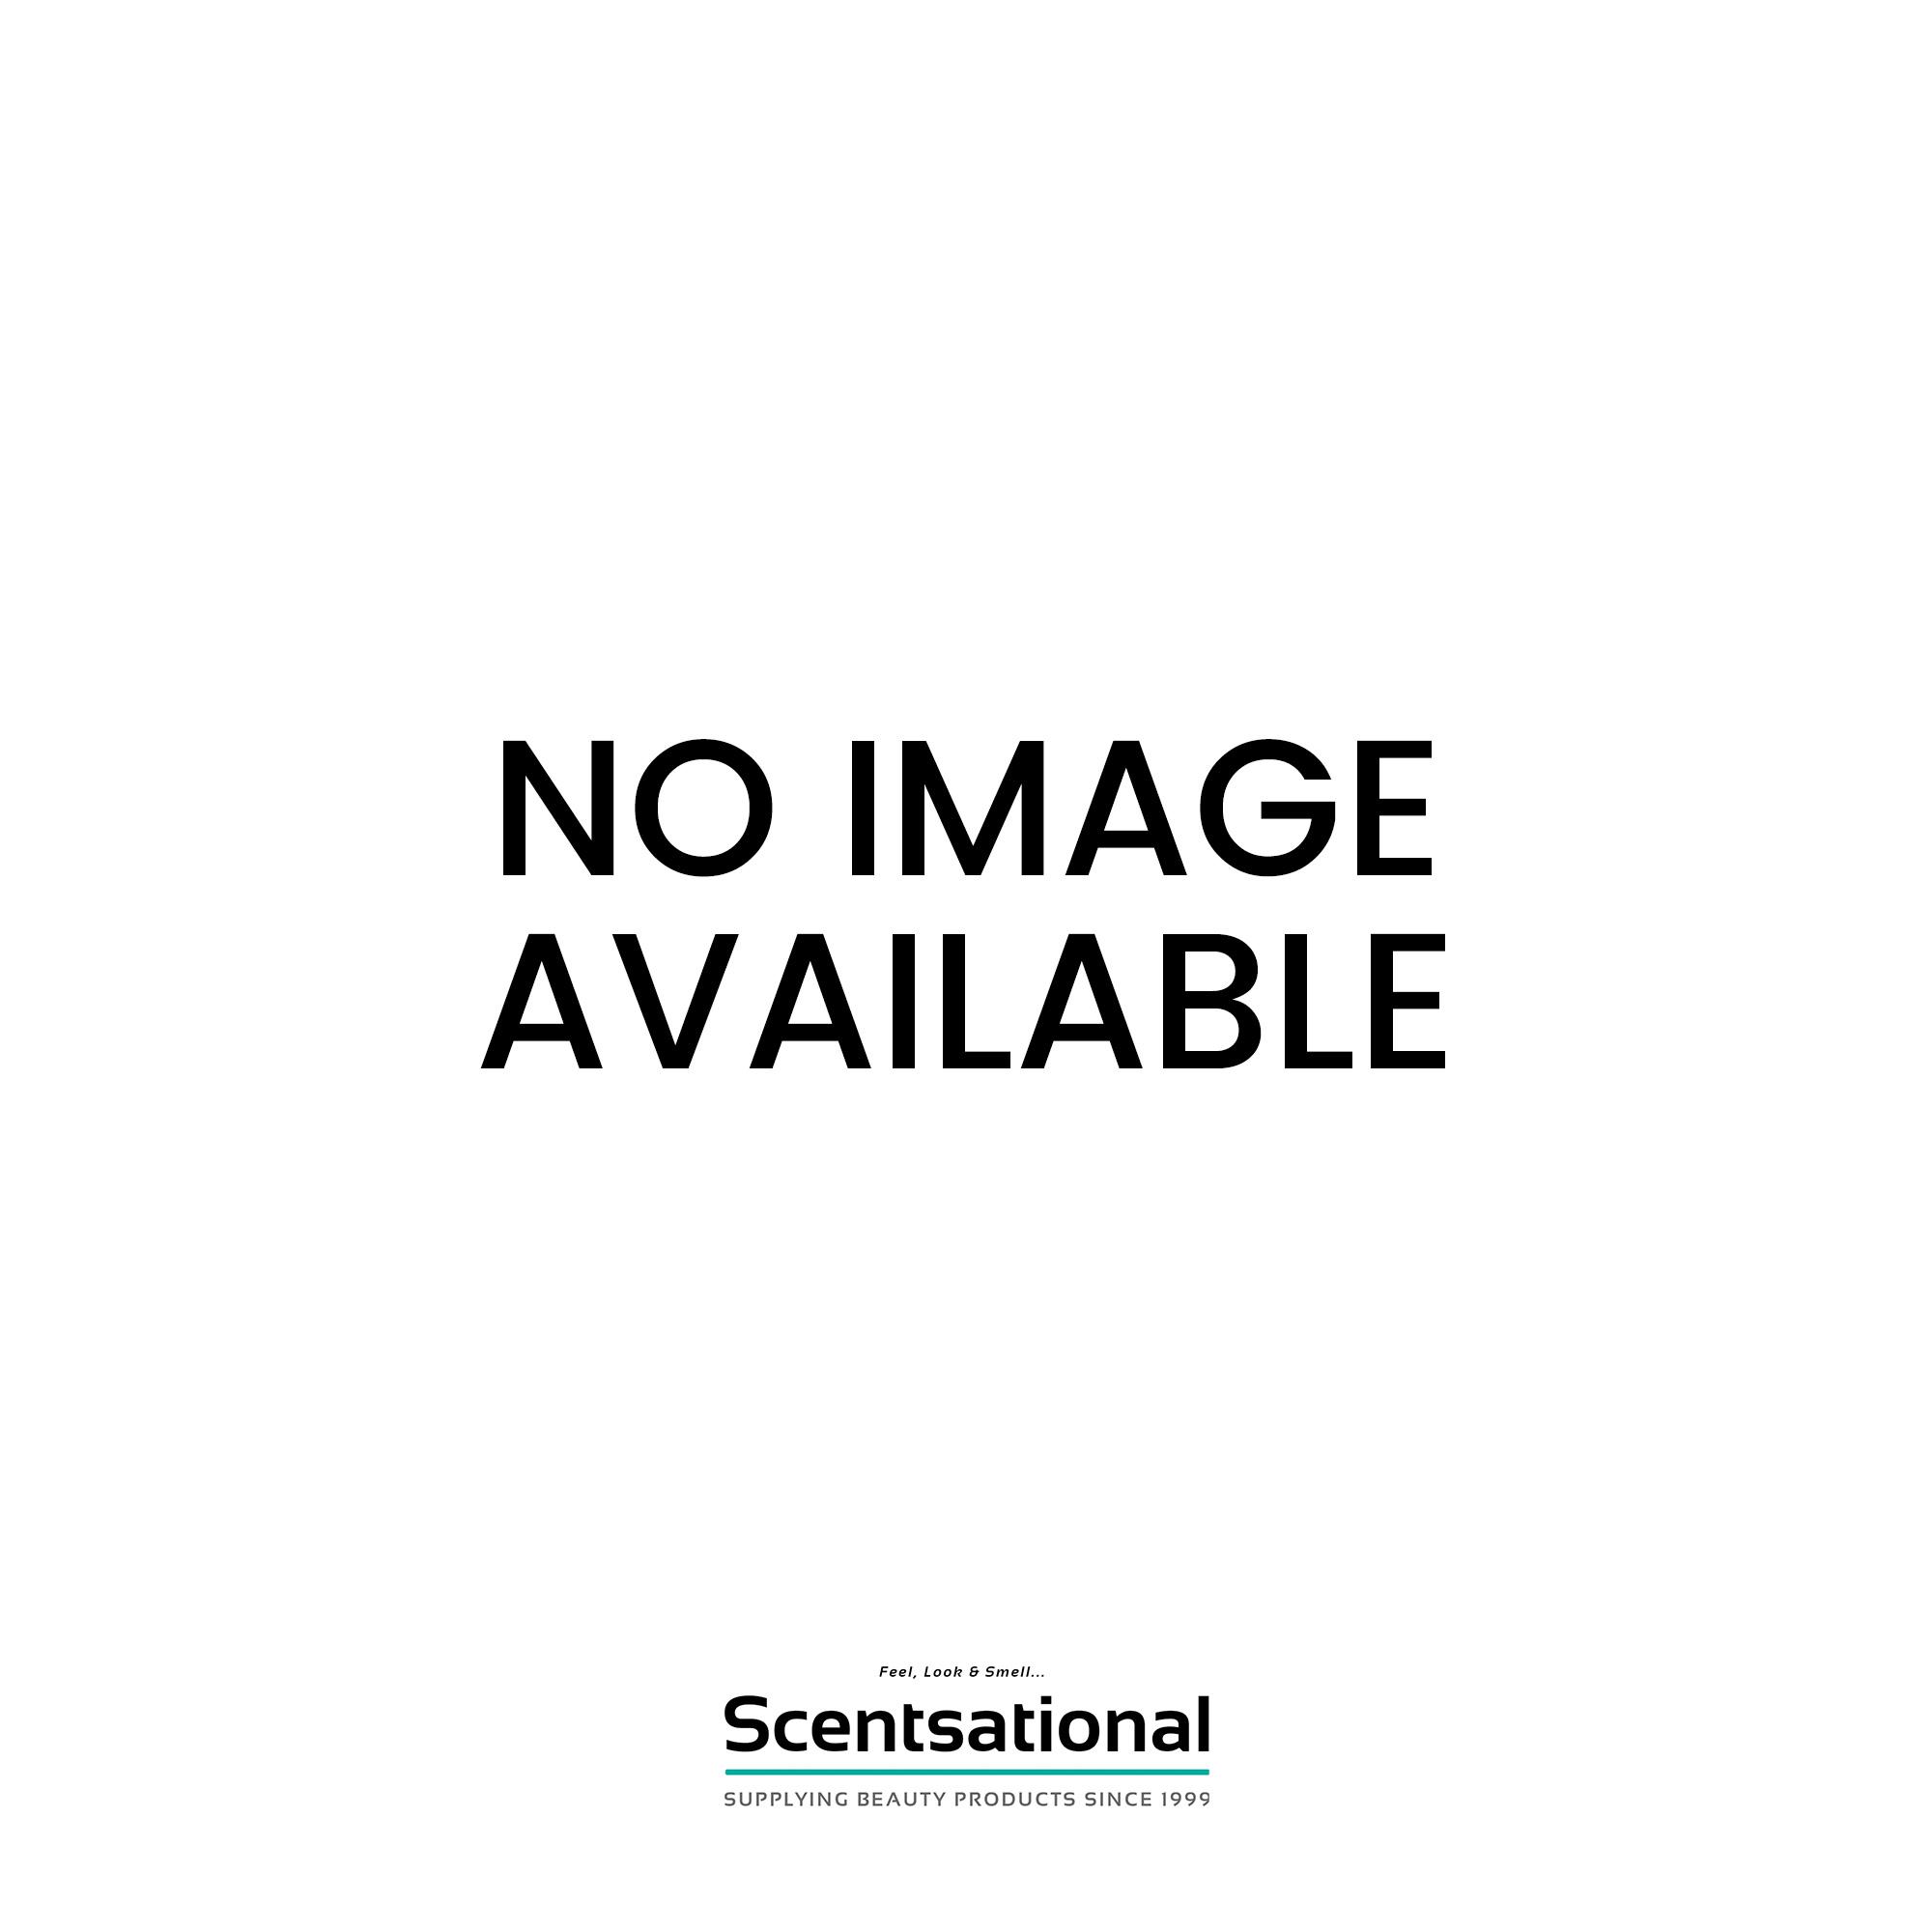 Ralph Lauren Big Pony Collection Body Spray - No1